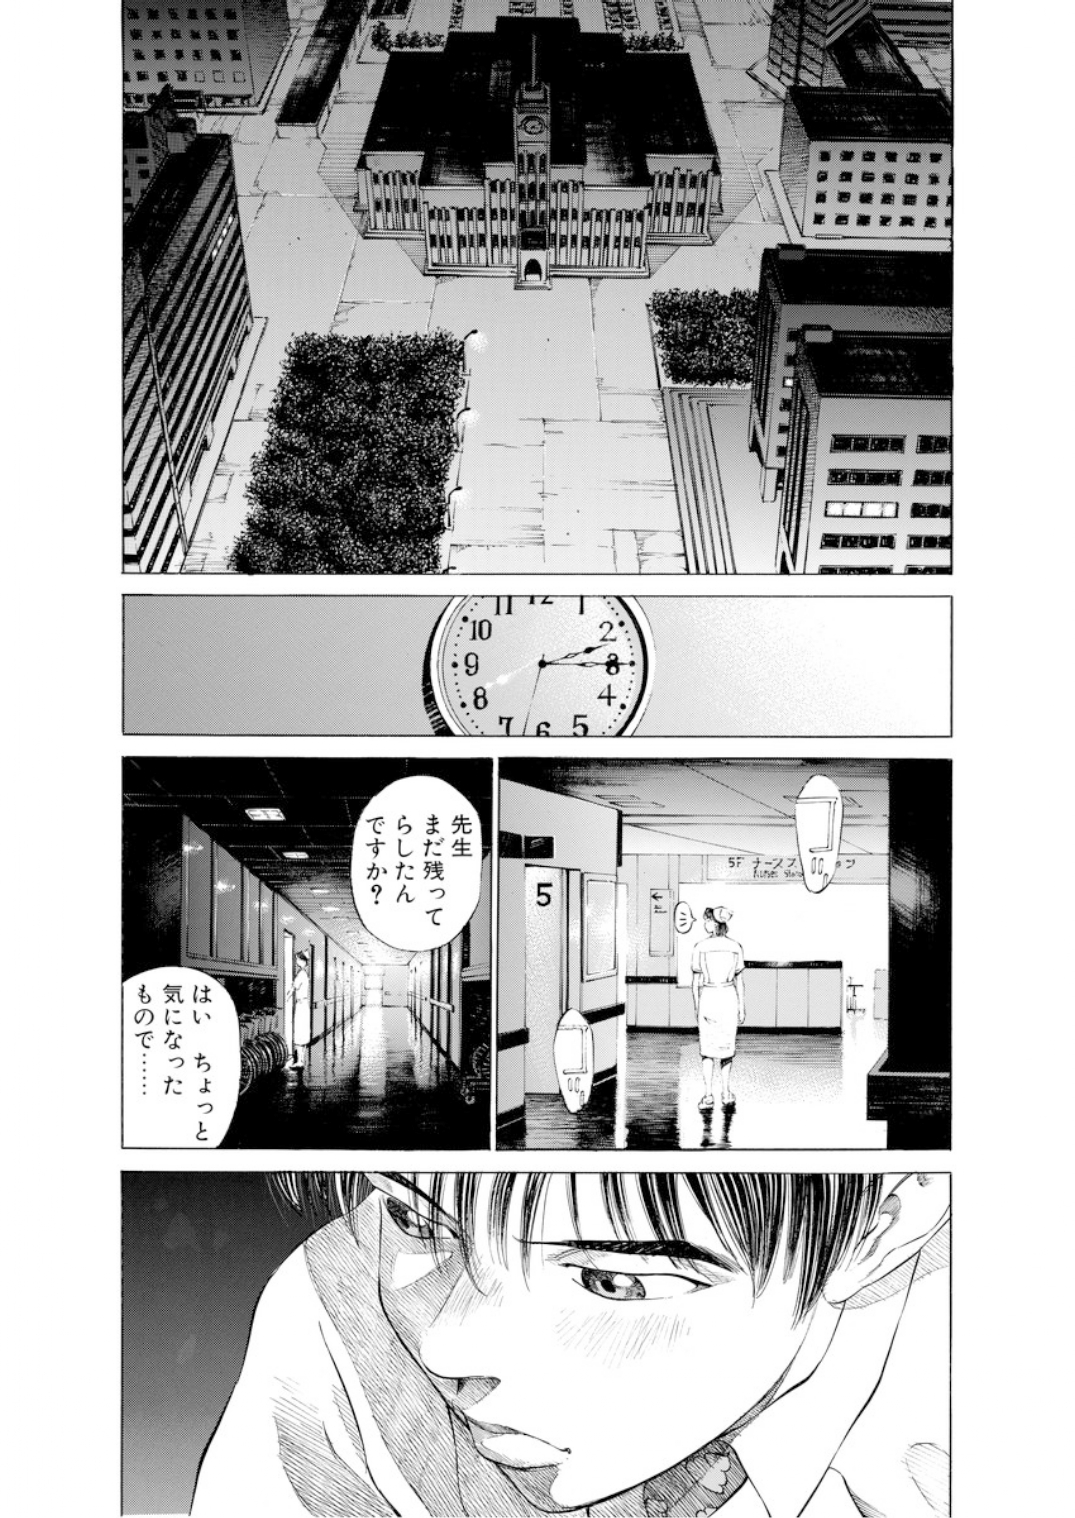 001bj_page-0087.jpg